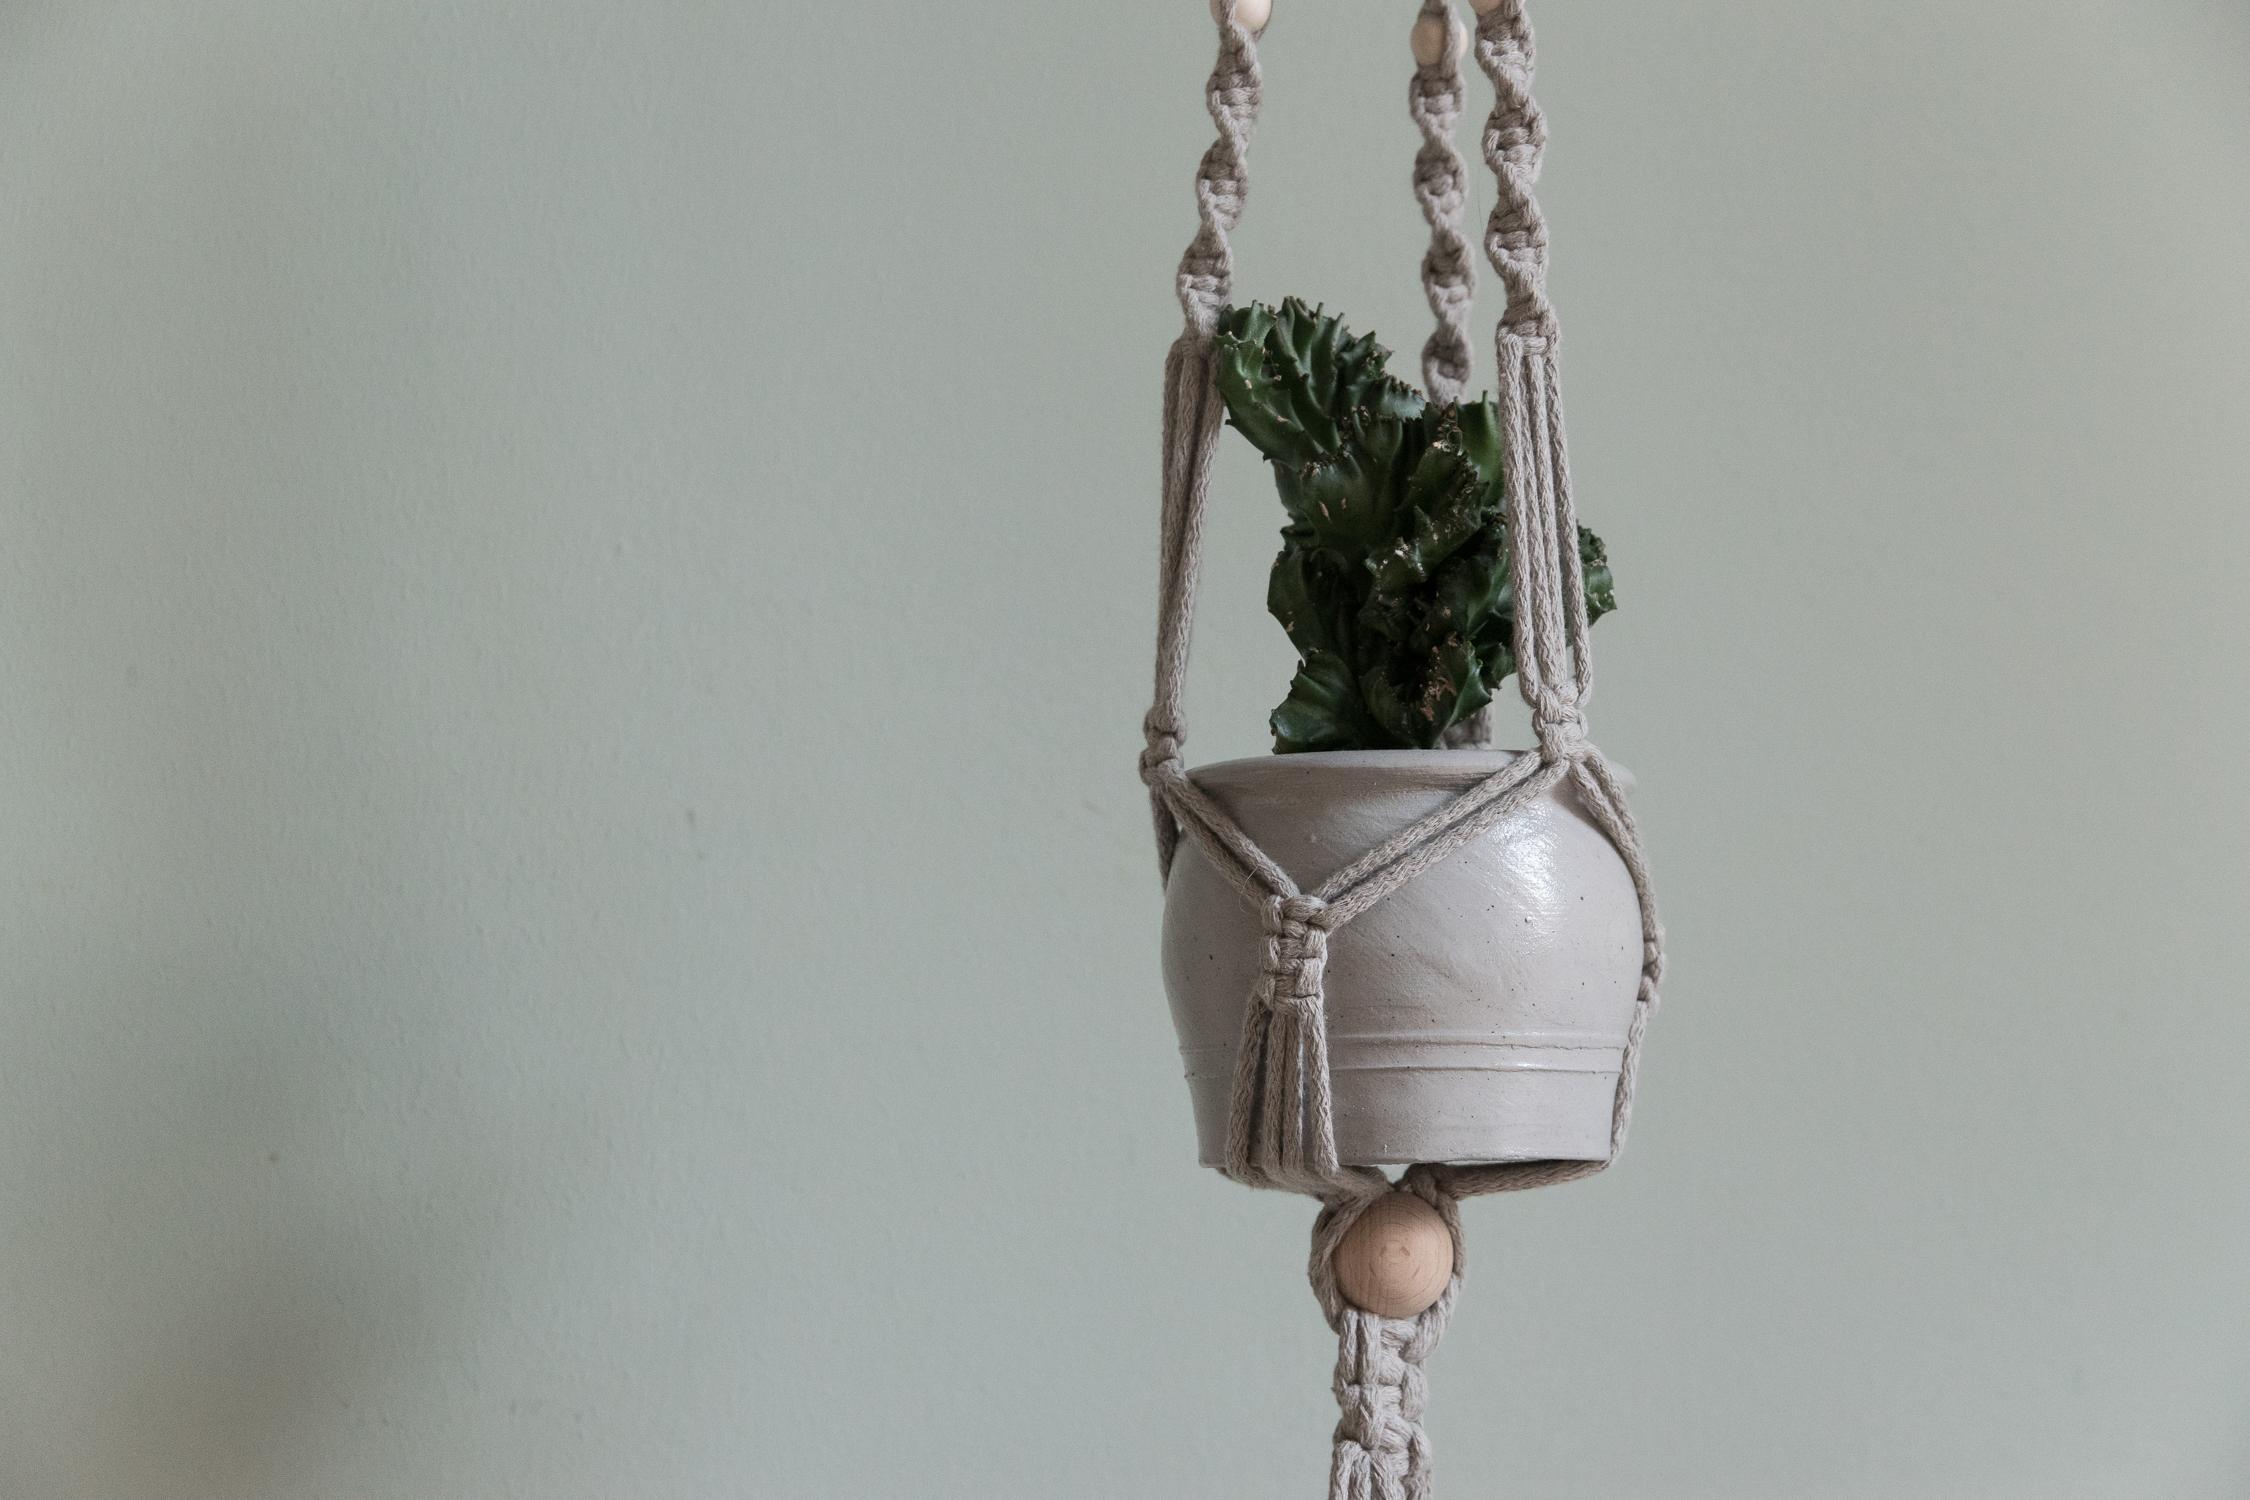 DIY Macrame plant hanger - www.craftifair.com